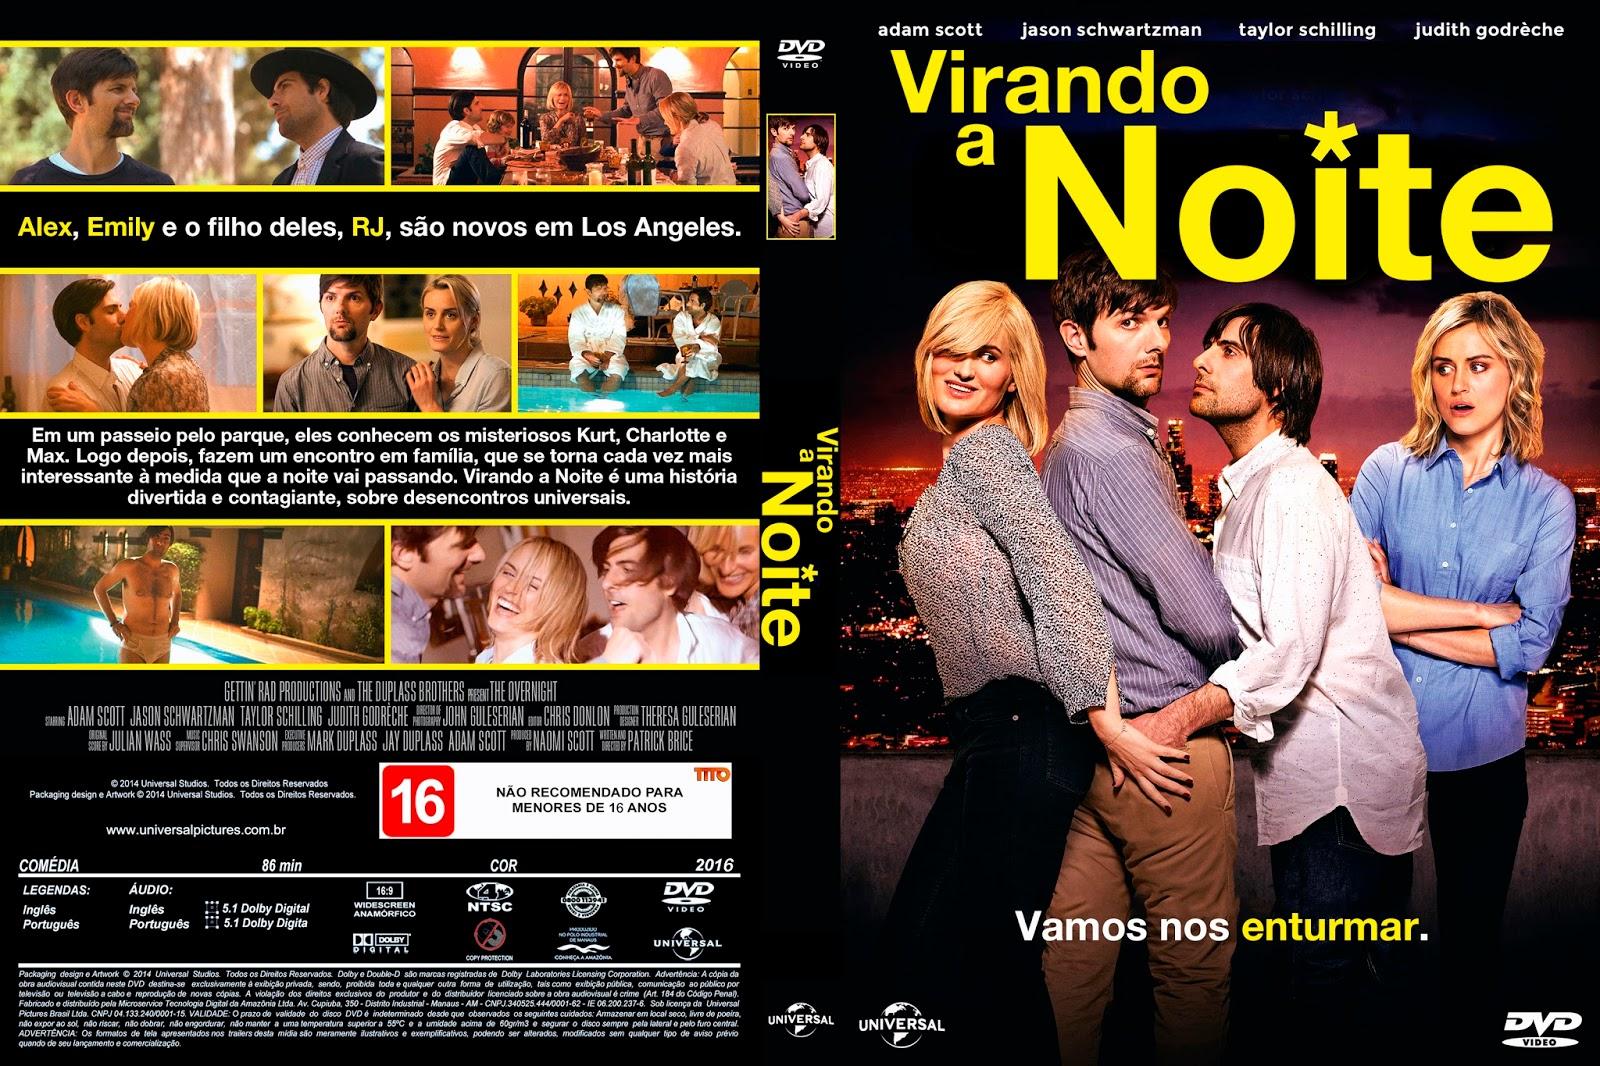 Virando a Noite DVDRip XviD Dual Áudio Virando 2Ba 2BNoite 2B  2BXANDAODOWNLOAD